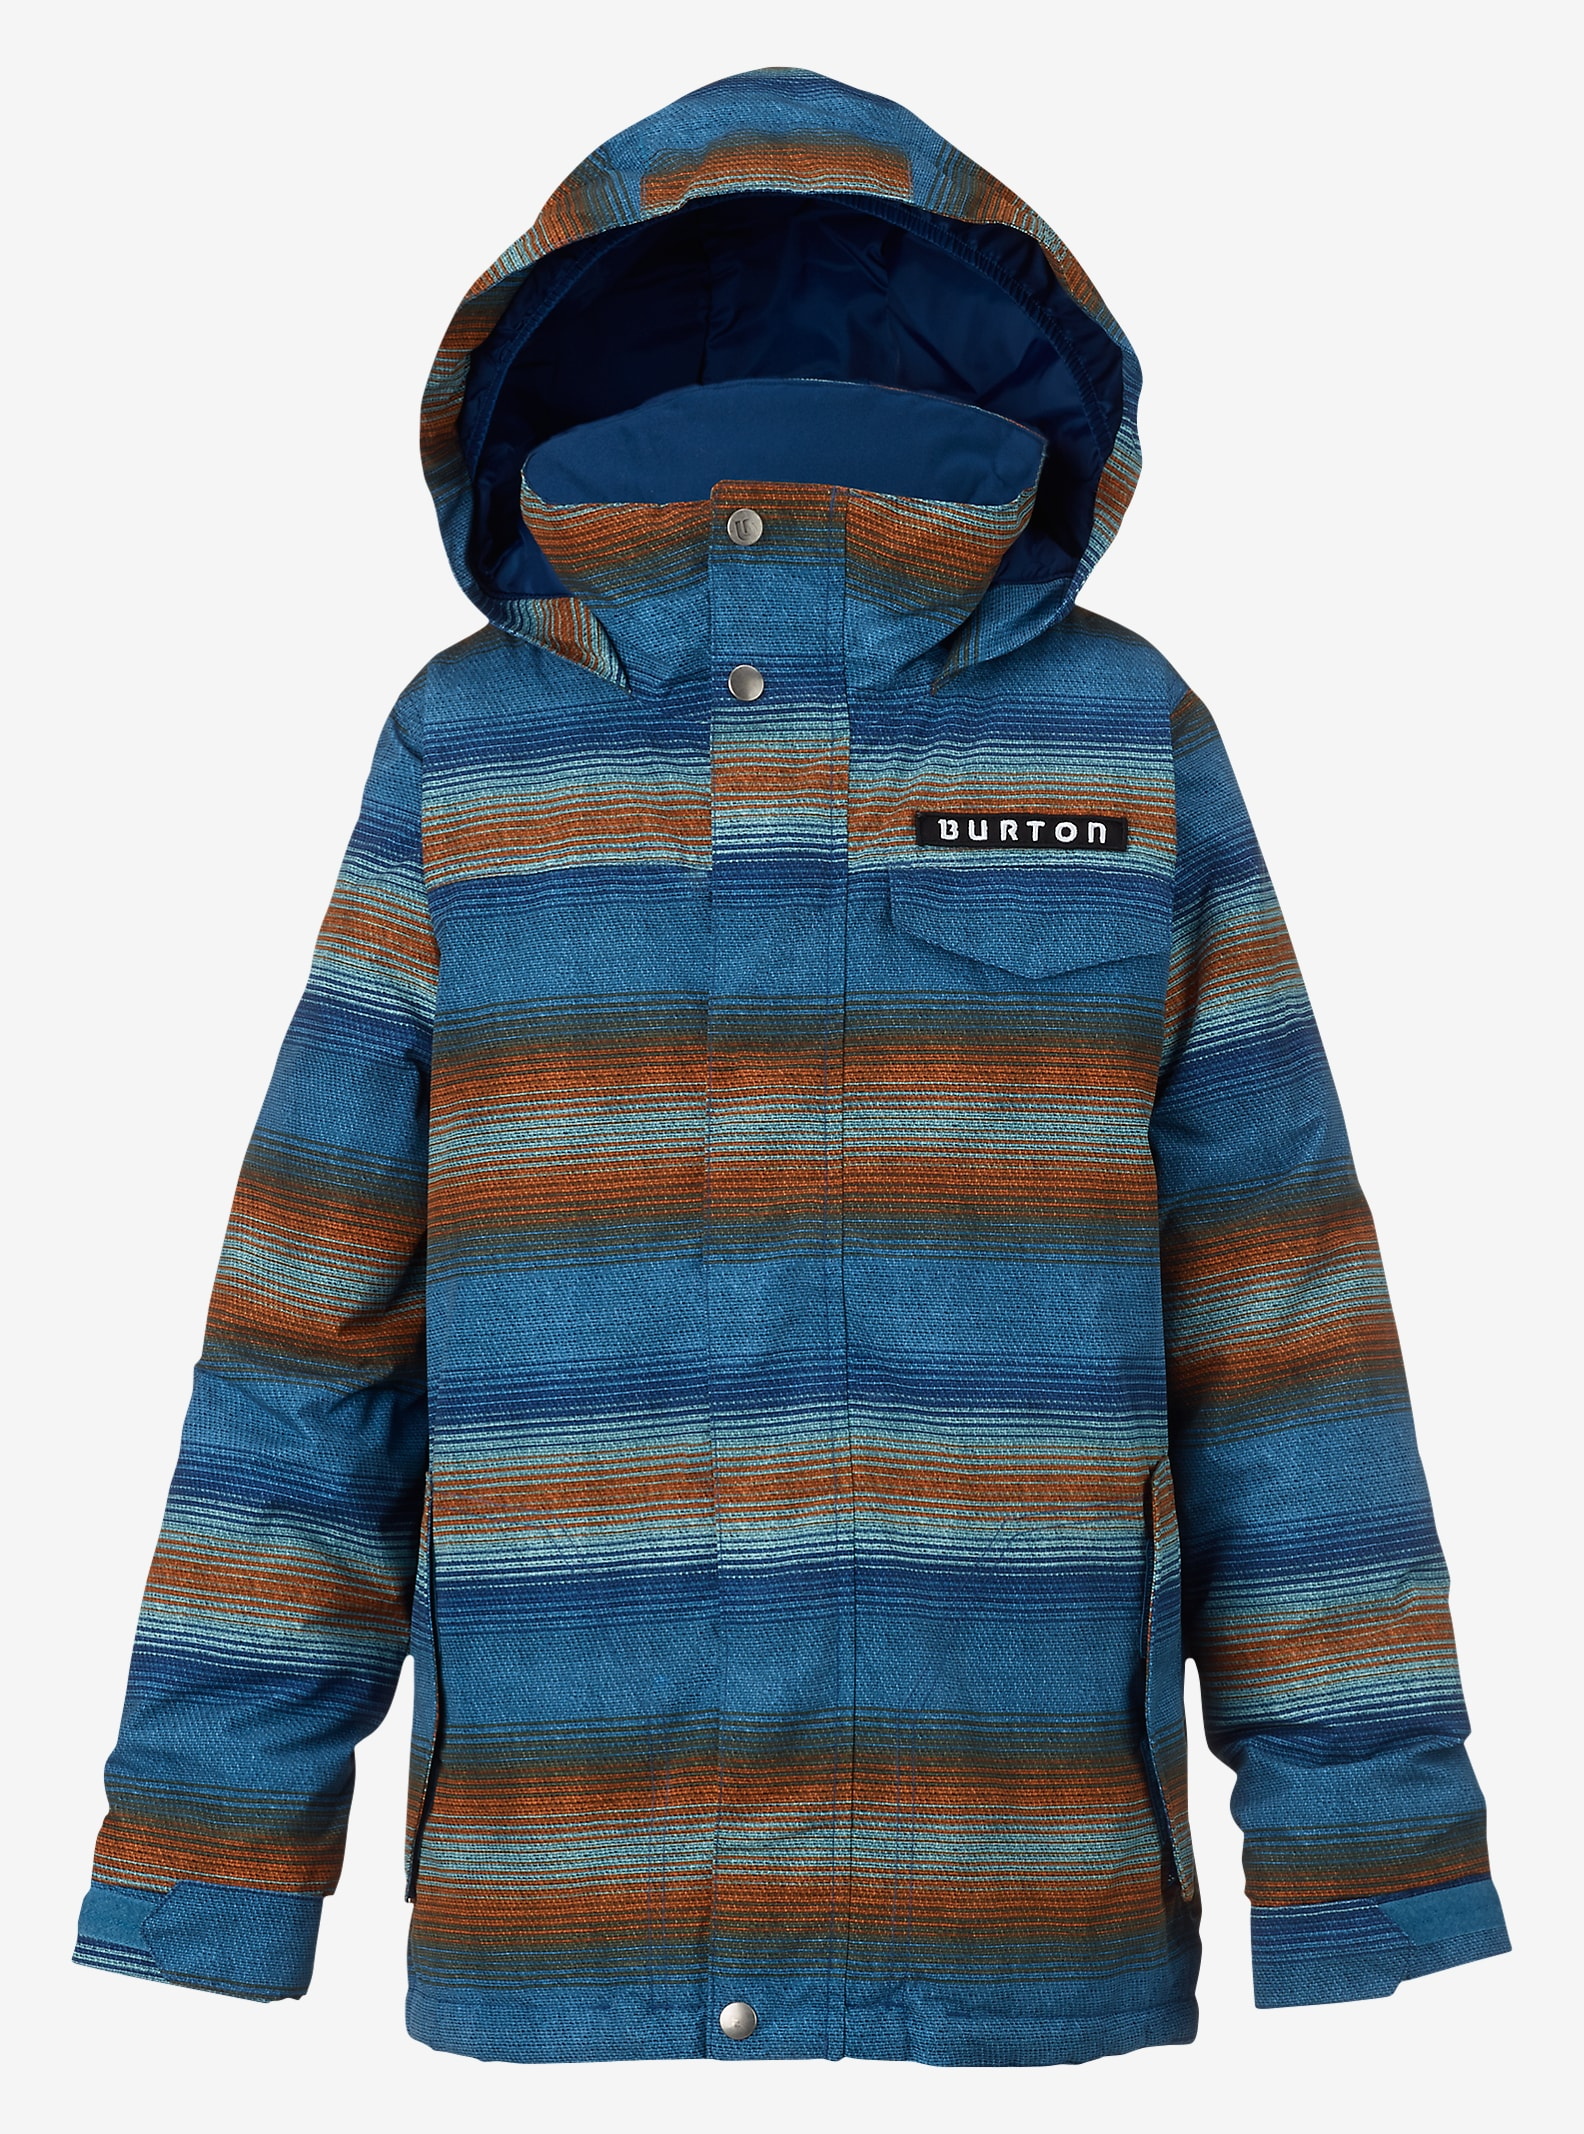 Burton Boys' Amped Jacket shown in Glacier Beach Stripe